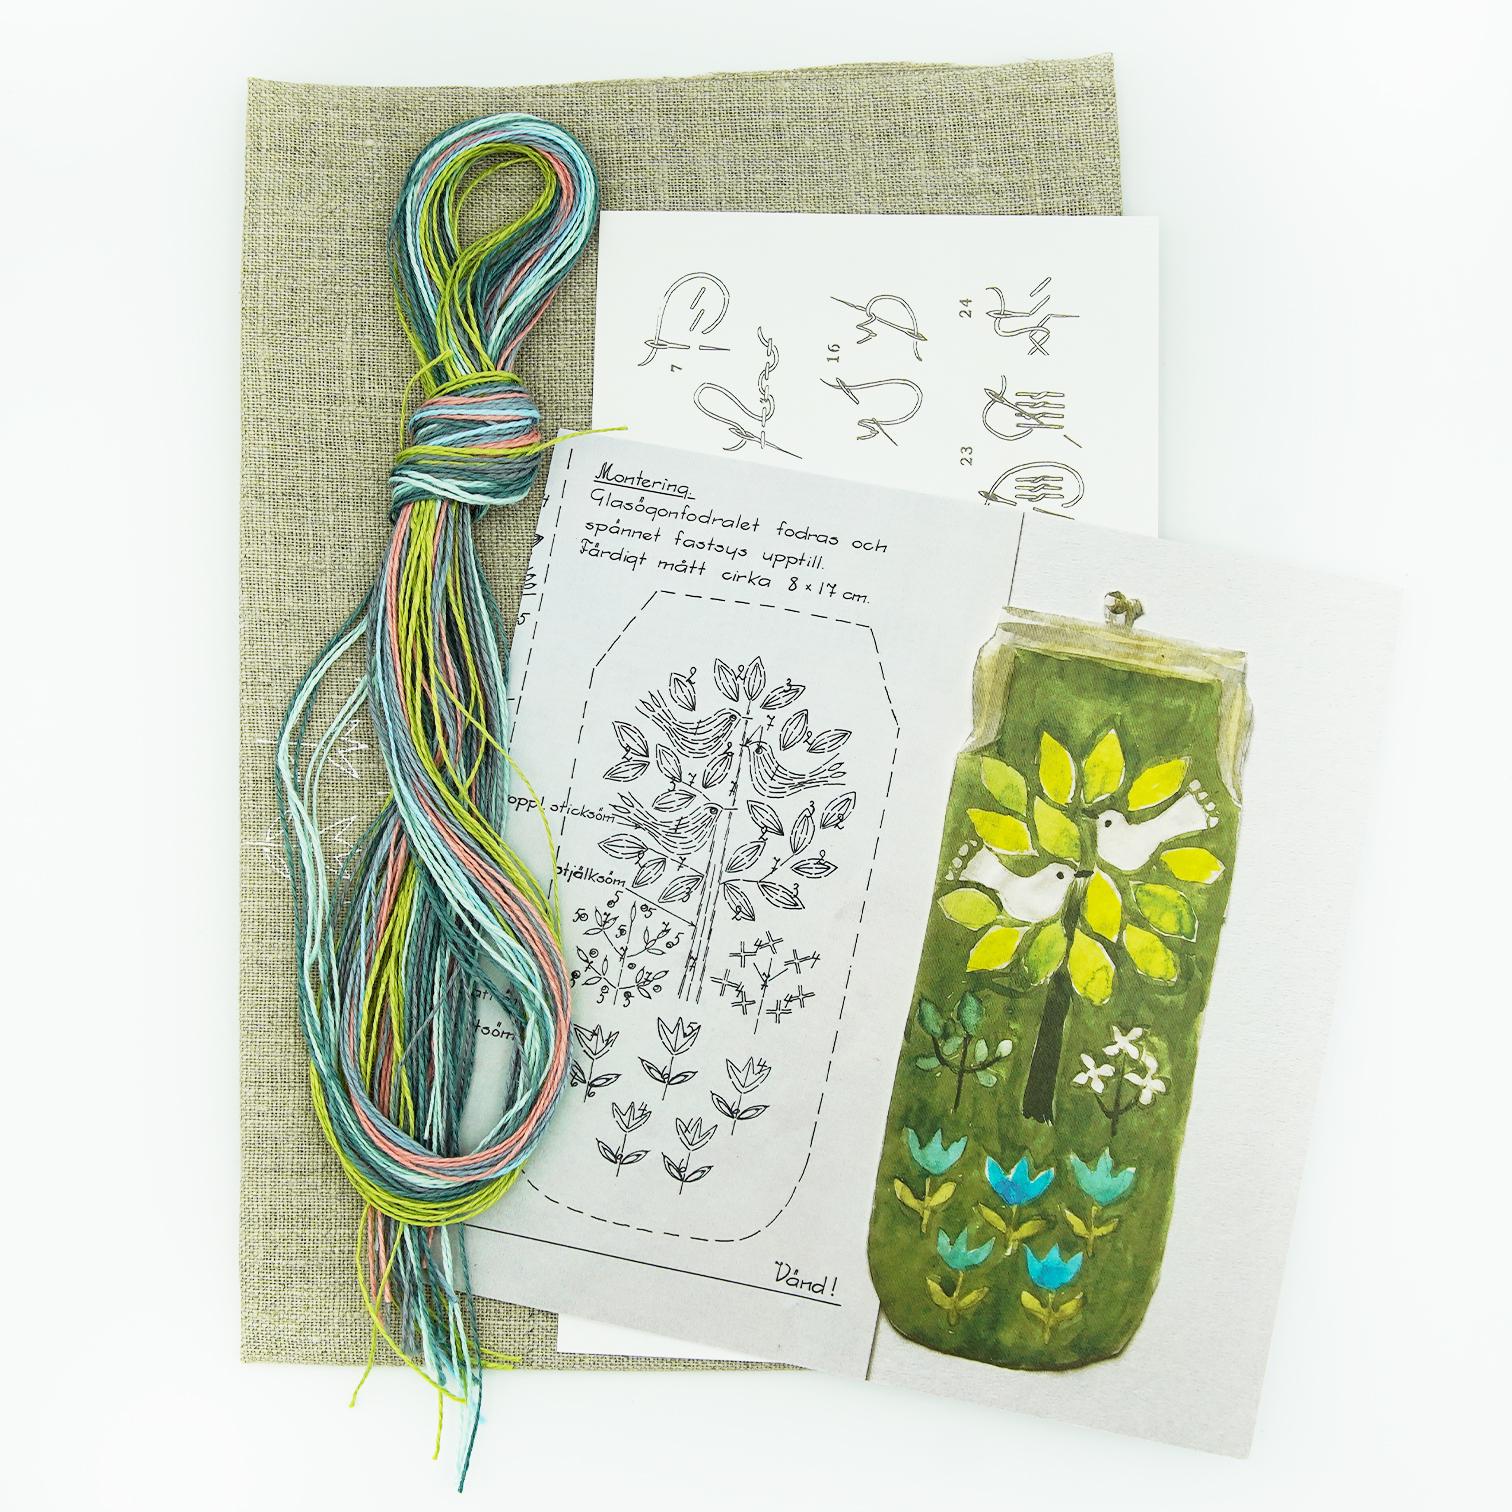 Linladan - Birds in Tree - Swedish Embroidery Kit 126